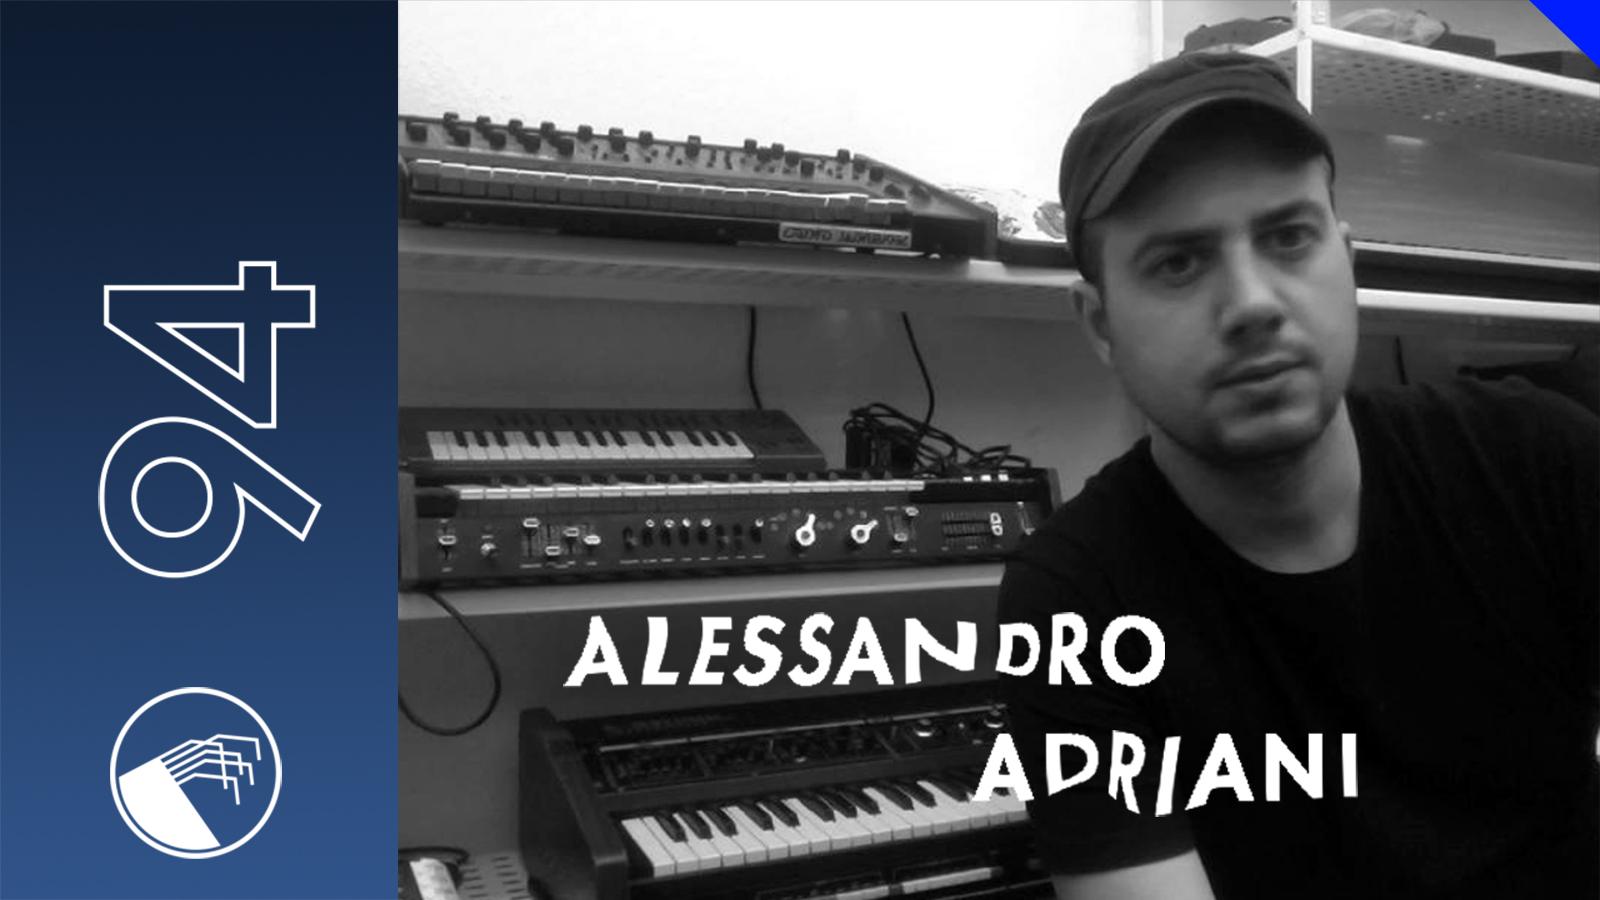 094 Alessandro Adriani